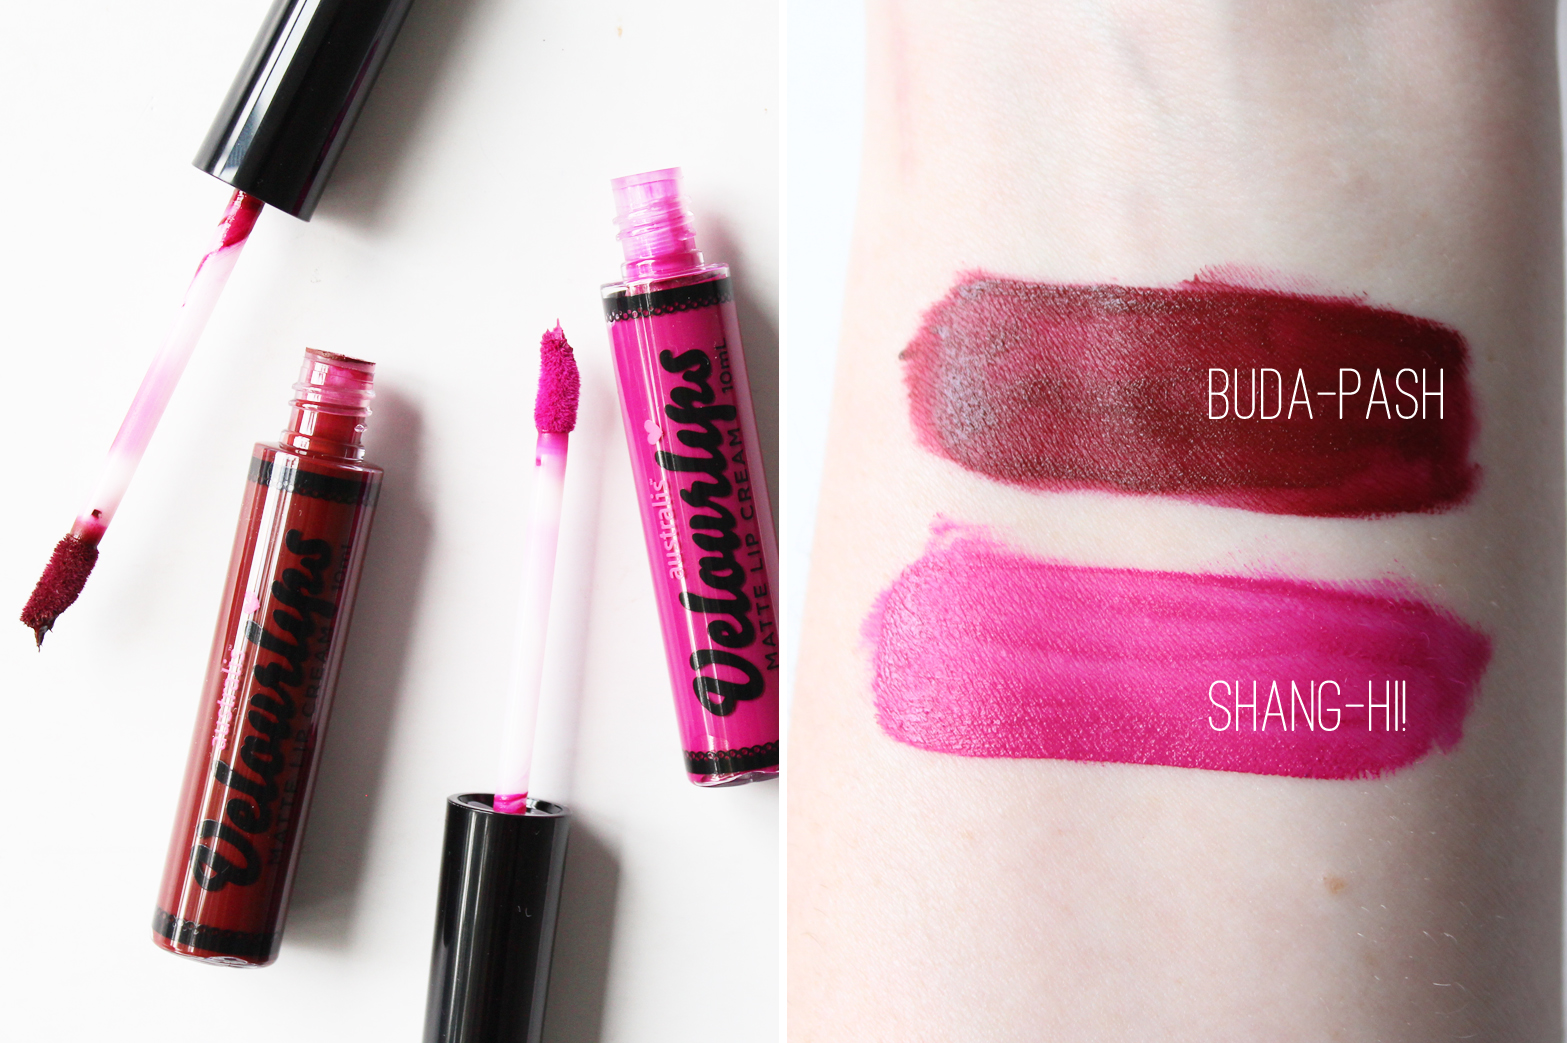 AUSTRALIS | New Releases - Mix It Foundation + New Velourlip Matte Lip Cream Shades - CassandraMyee